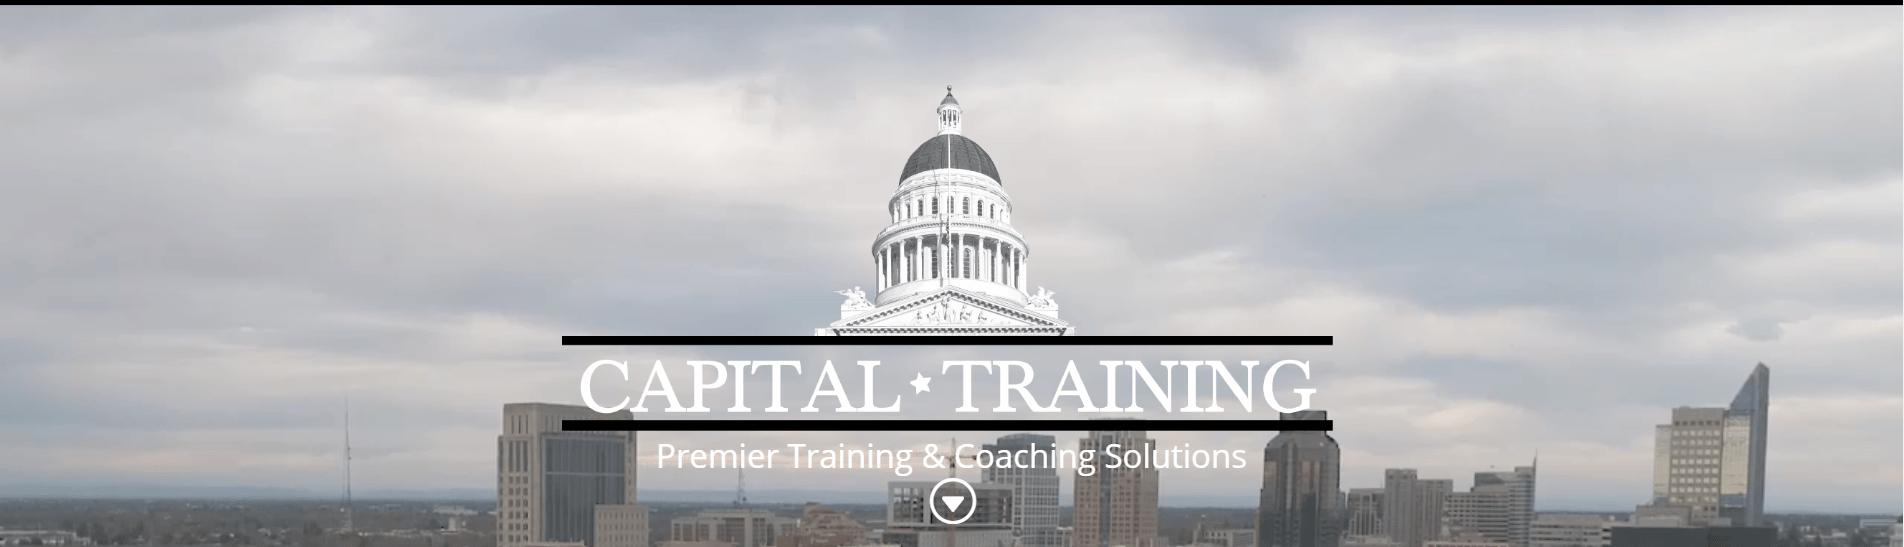 Capital Training